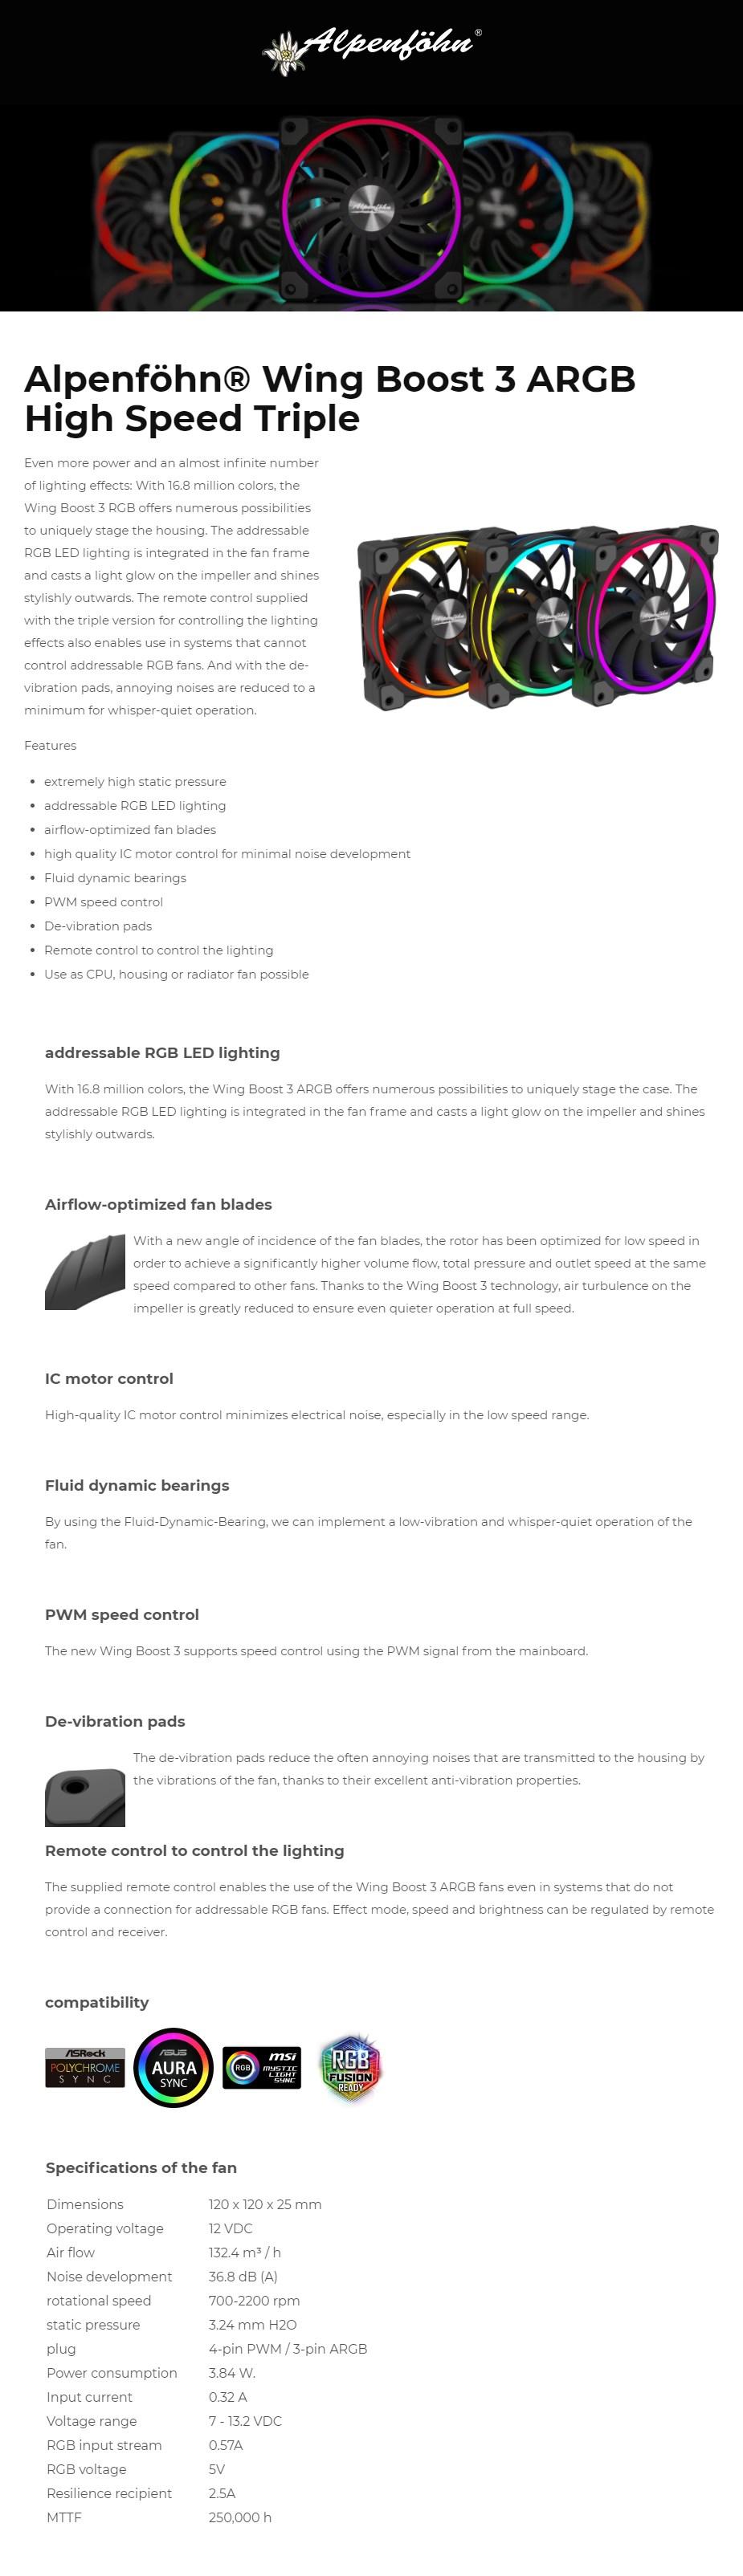 Alpenfohn 3 ARGB High Speed PWM 120mm White Case Fan - 3 Pack - Overview 1